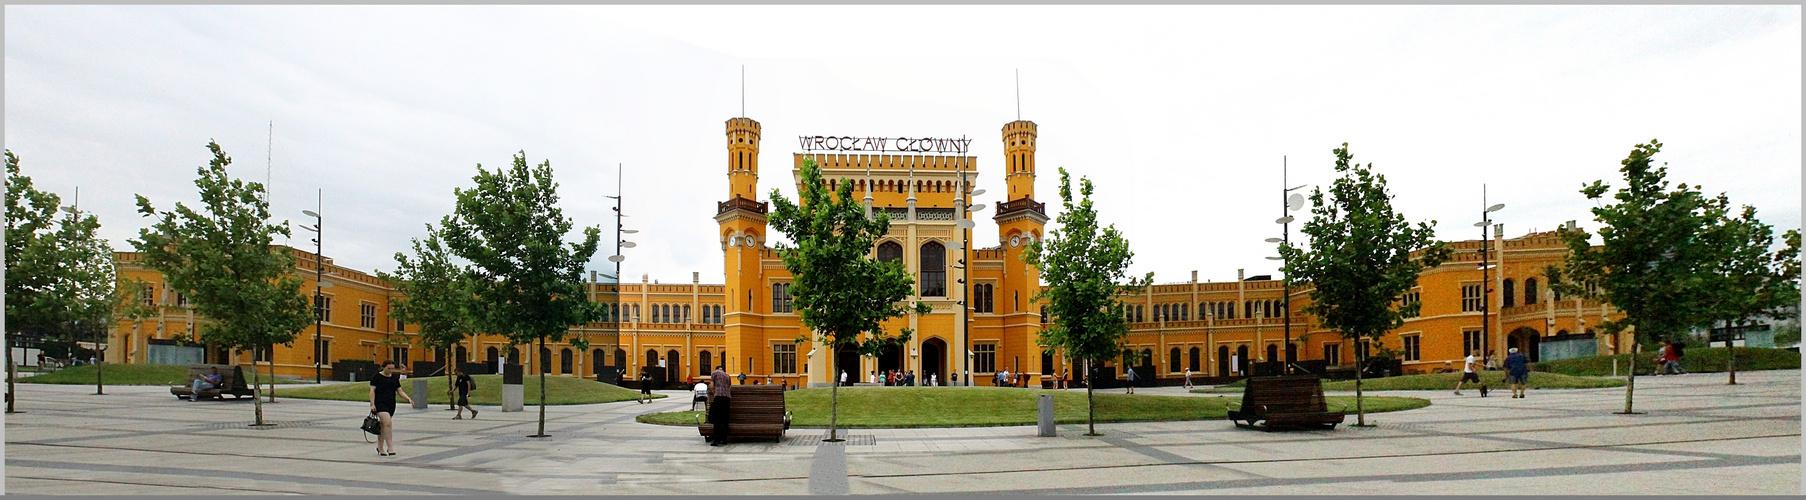 Hauptbahnhof Wroclaw ( Breslau) im Tudorstil